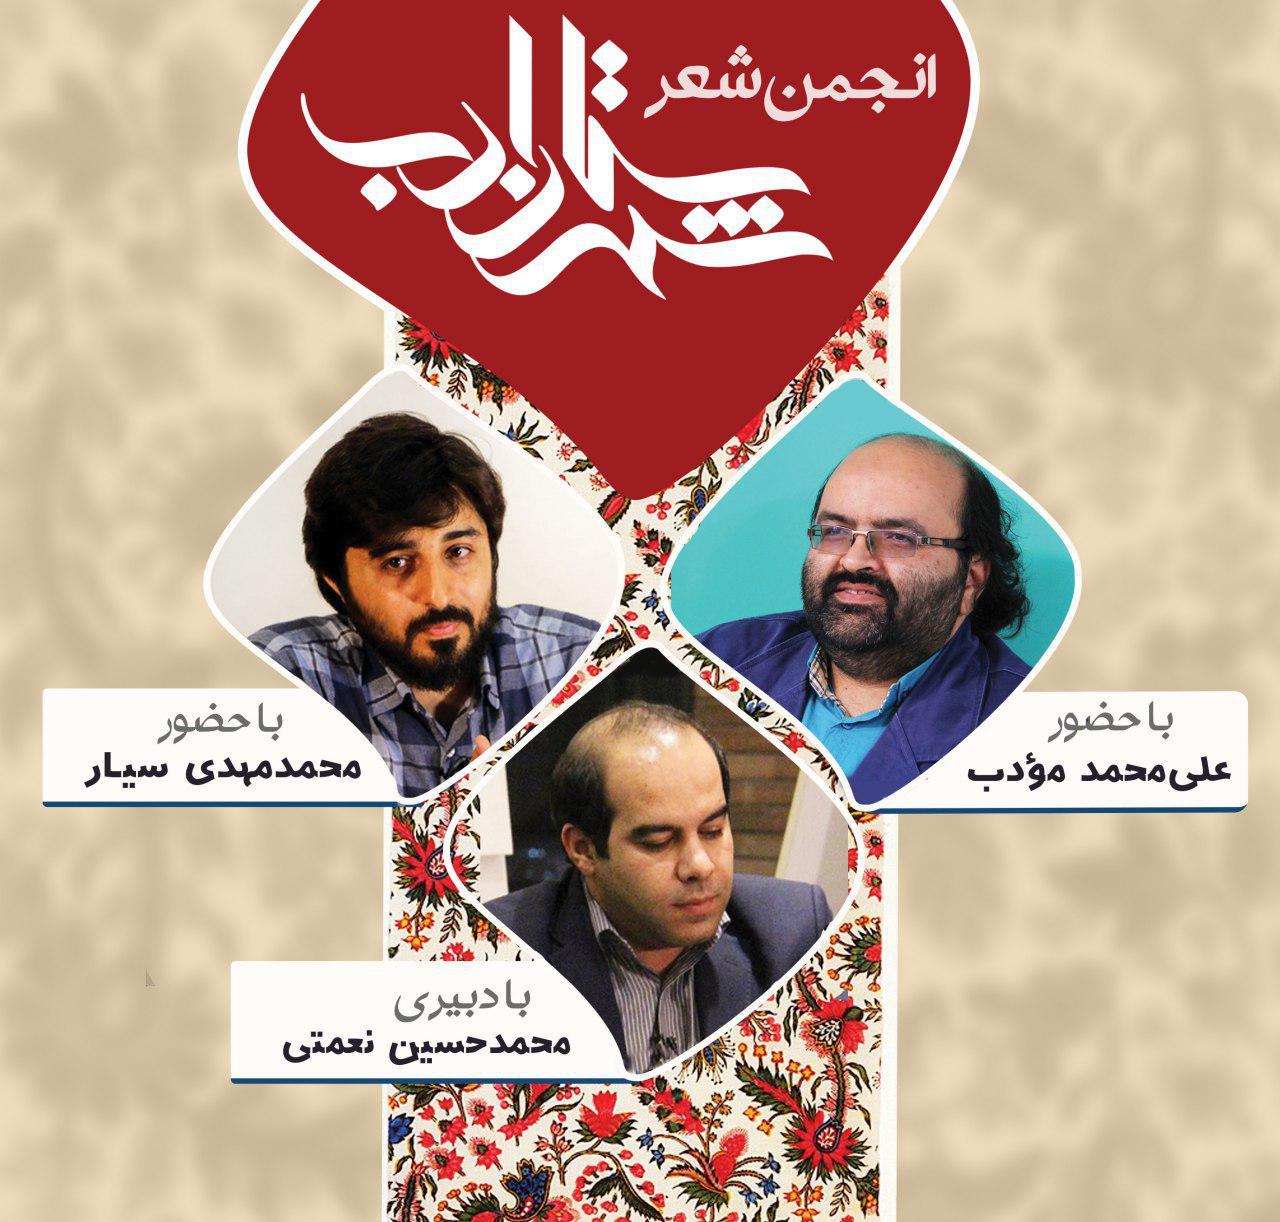 انجمن شعر شهرستان ادب